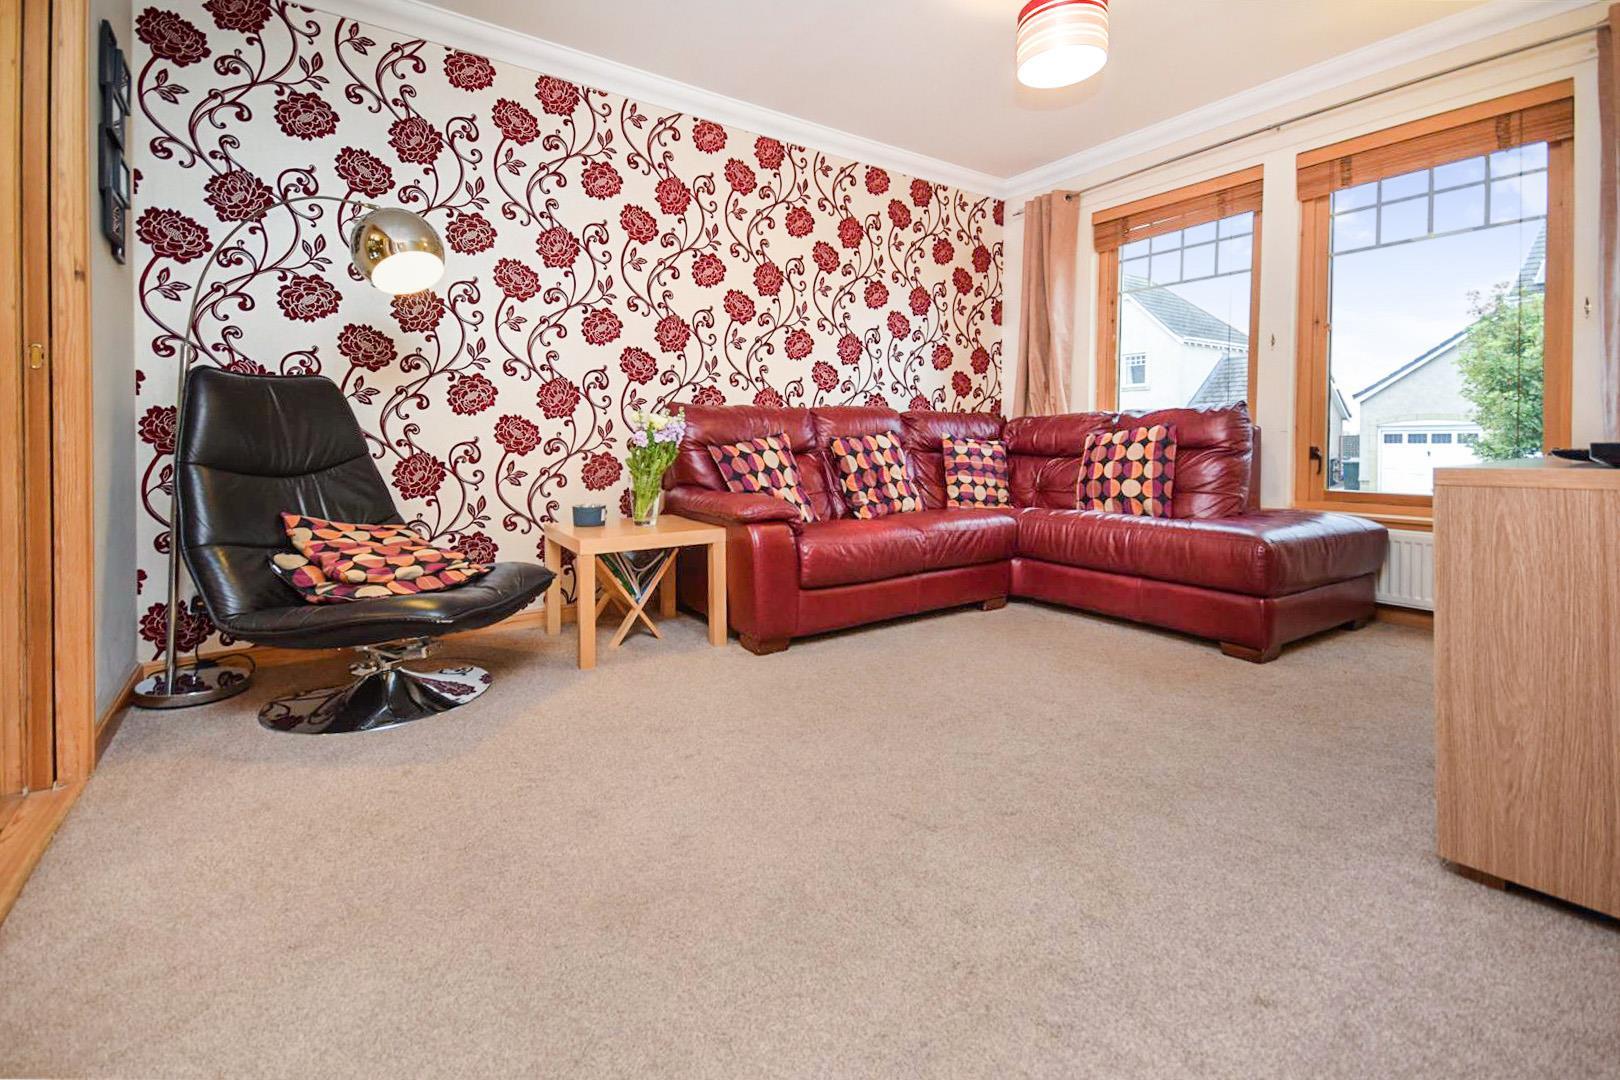 14, Nethy Place, Abernethy, Perth, Perthshire, PH2 9GZ, UK